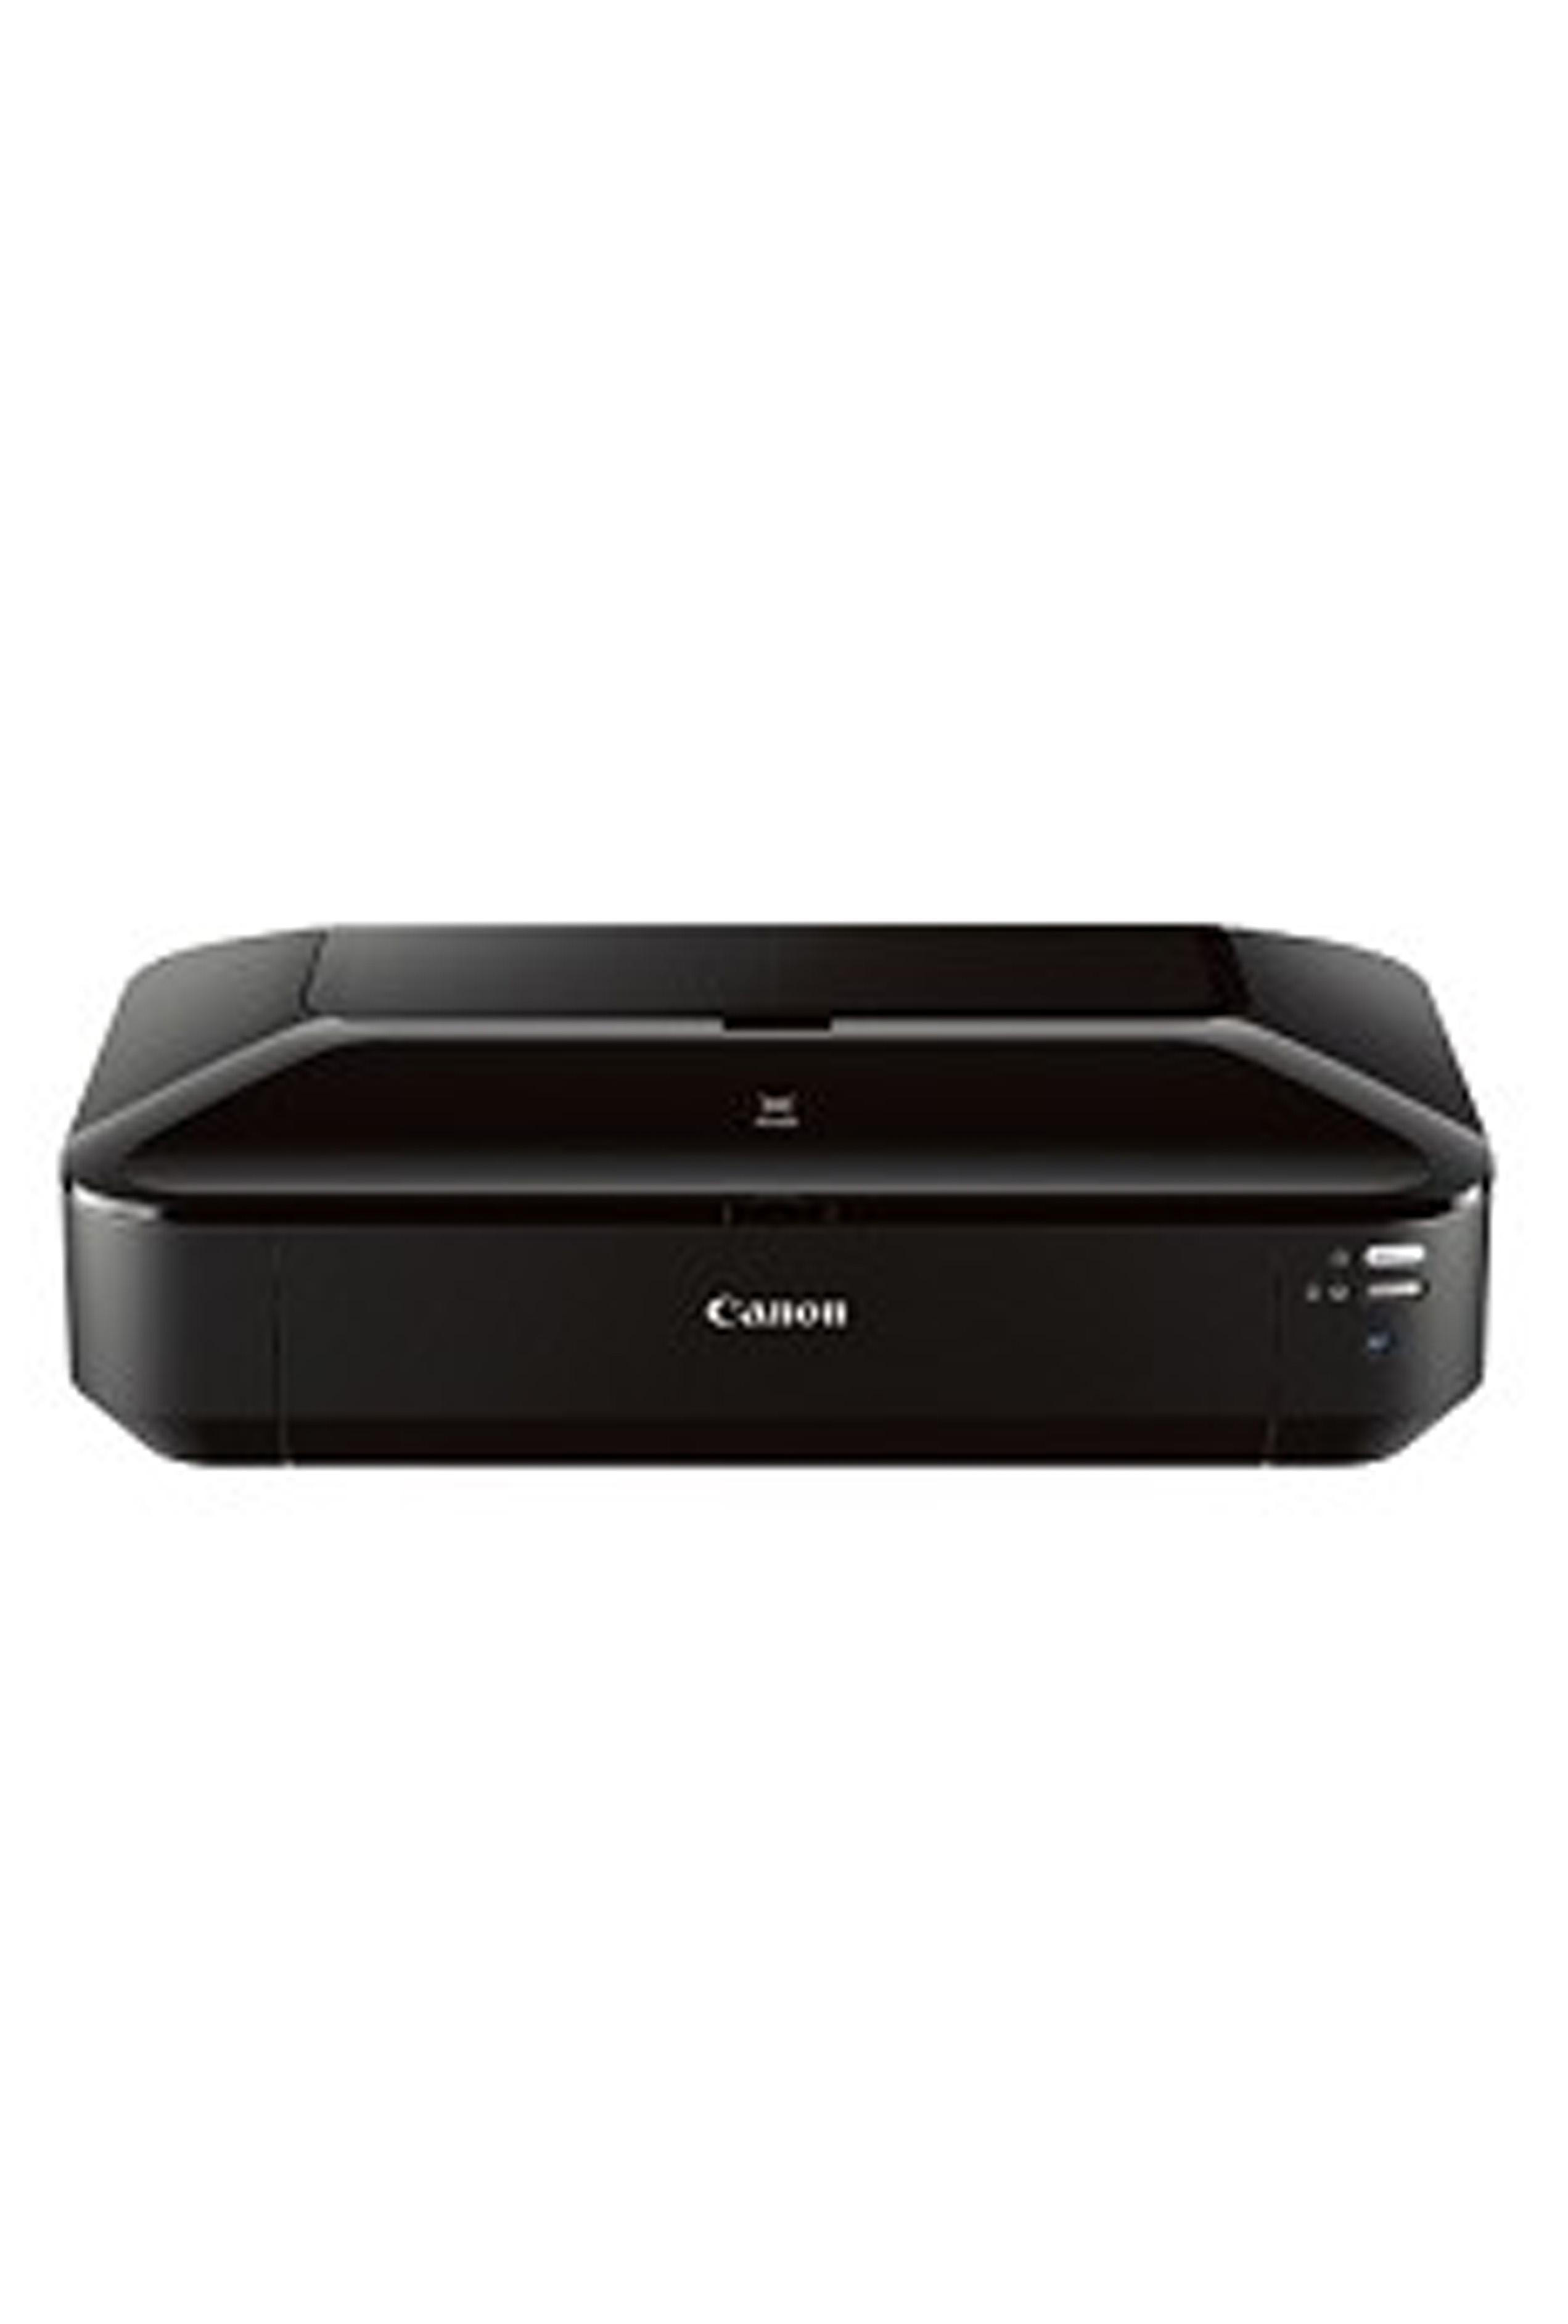 Canon PIXMA IX6820 (14.5ipm/10.5ipm)